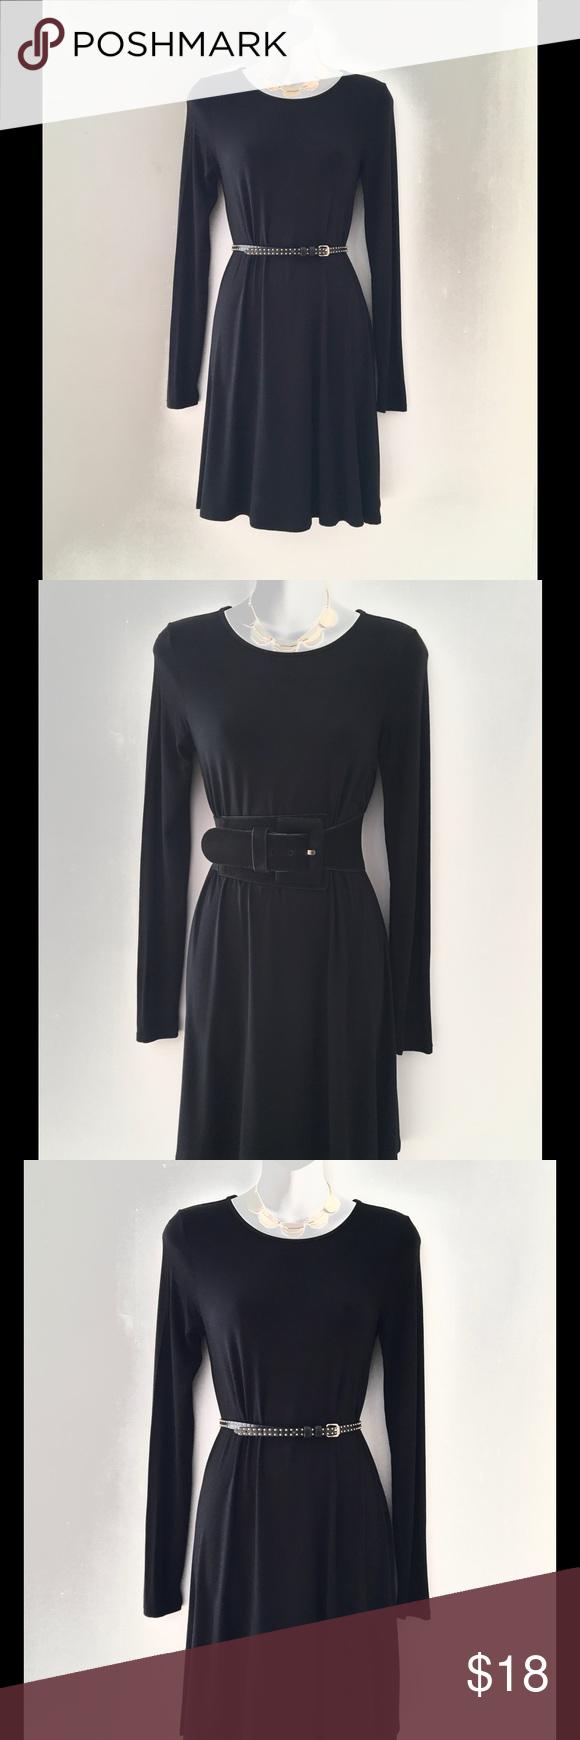 Little black jersey dress sz xs shoulder